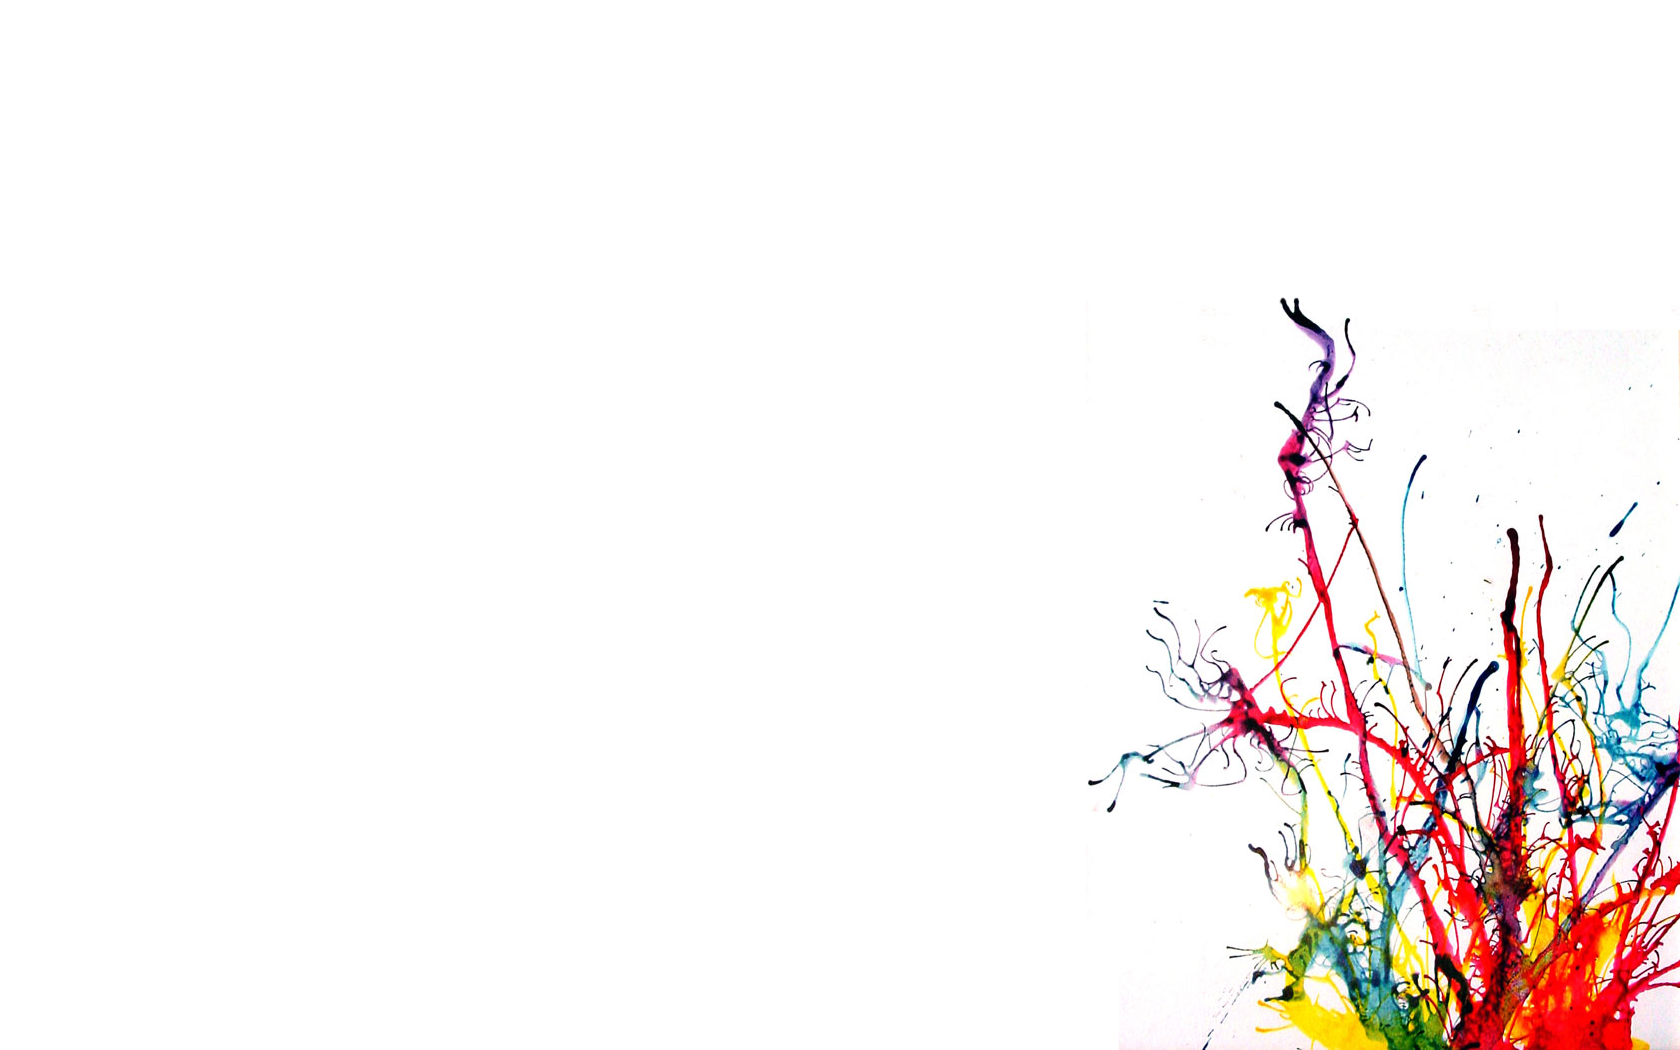 Color Palette For Website Color Splash Wallpaper Wallpapersafari